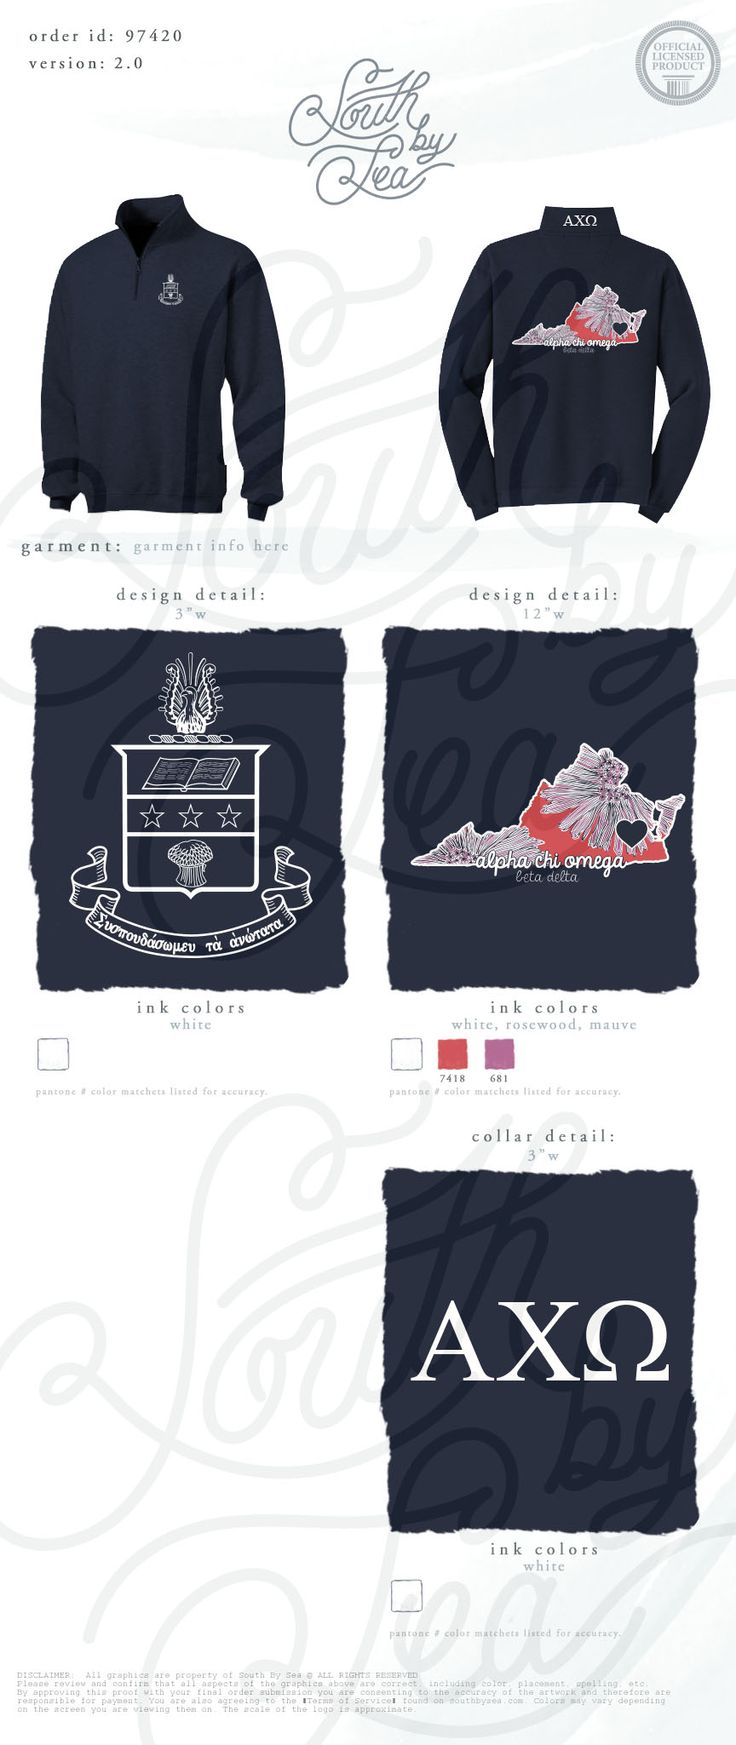 Design t shirt idea - Alpha Chi Omega Axo Quarter Zip Designs Virginia Home State Tie Dye